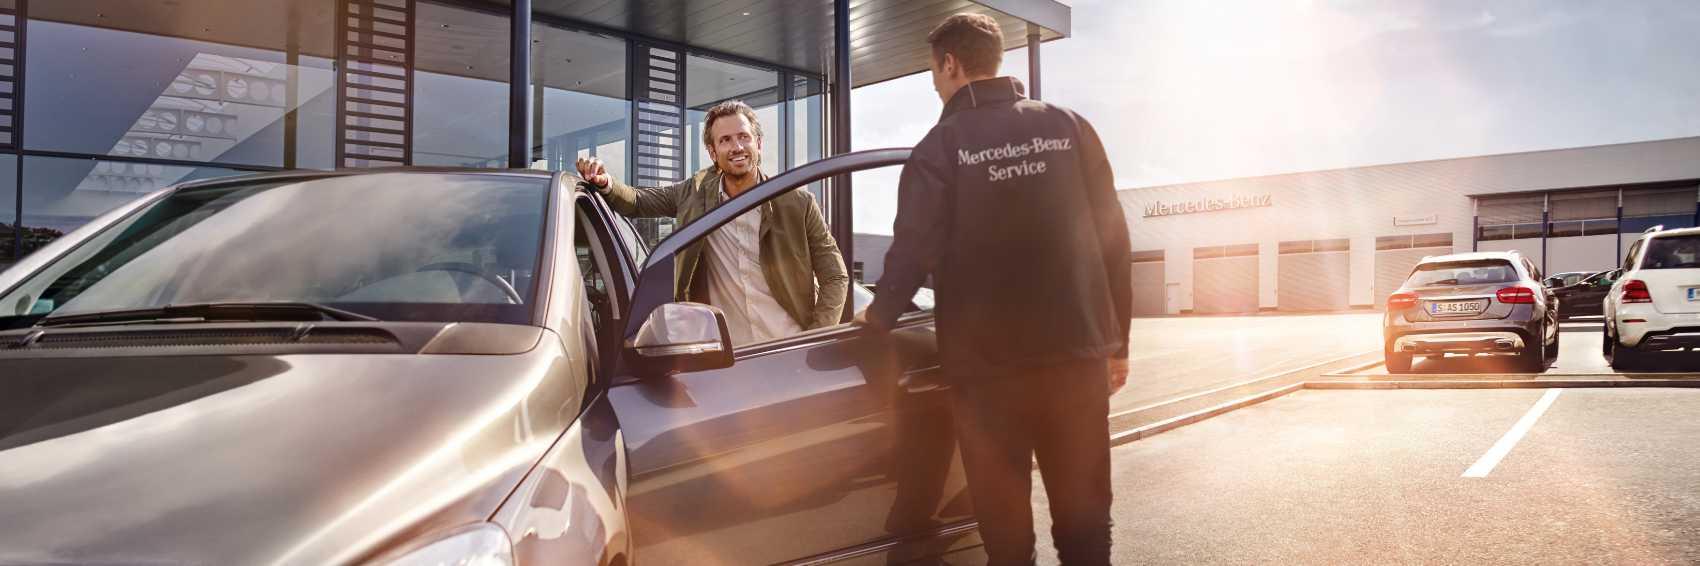 Qualität bei Mercedes-Benz